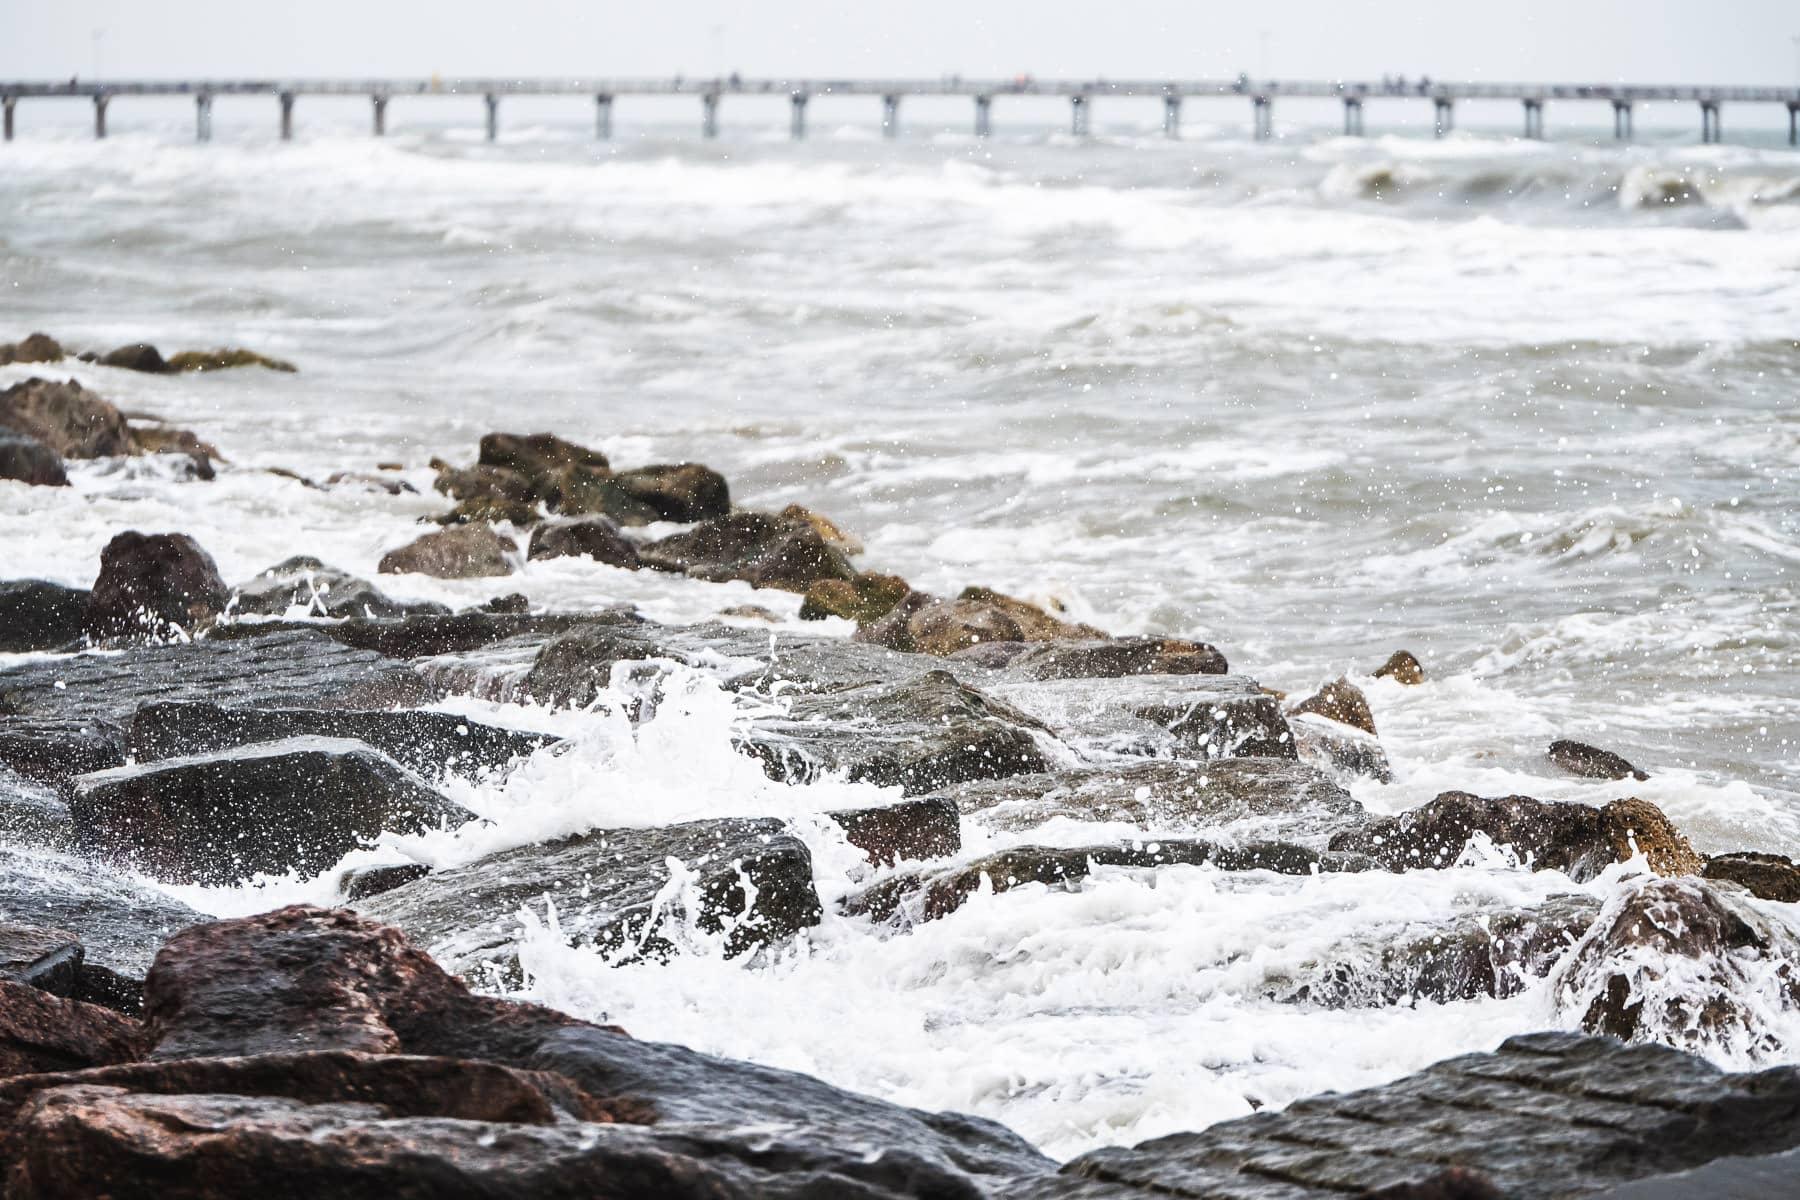 Surf crashes onto granite blocks along the seawall in Galveston, Texas.